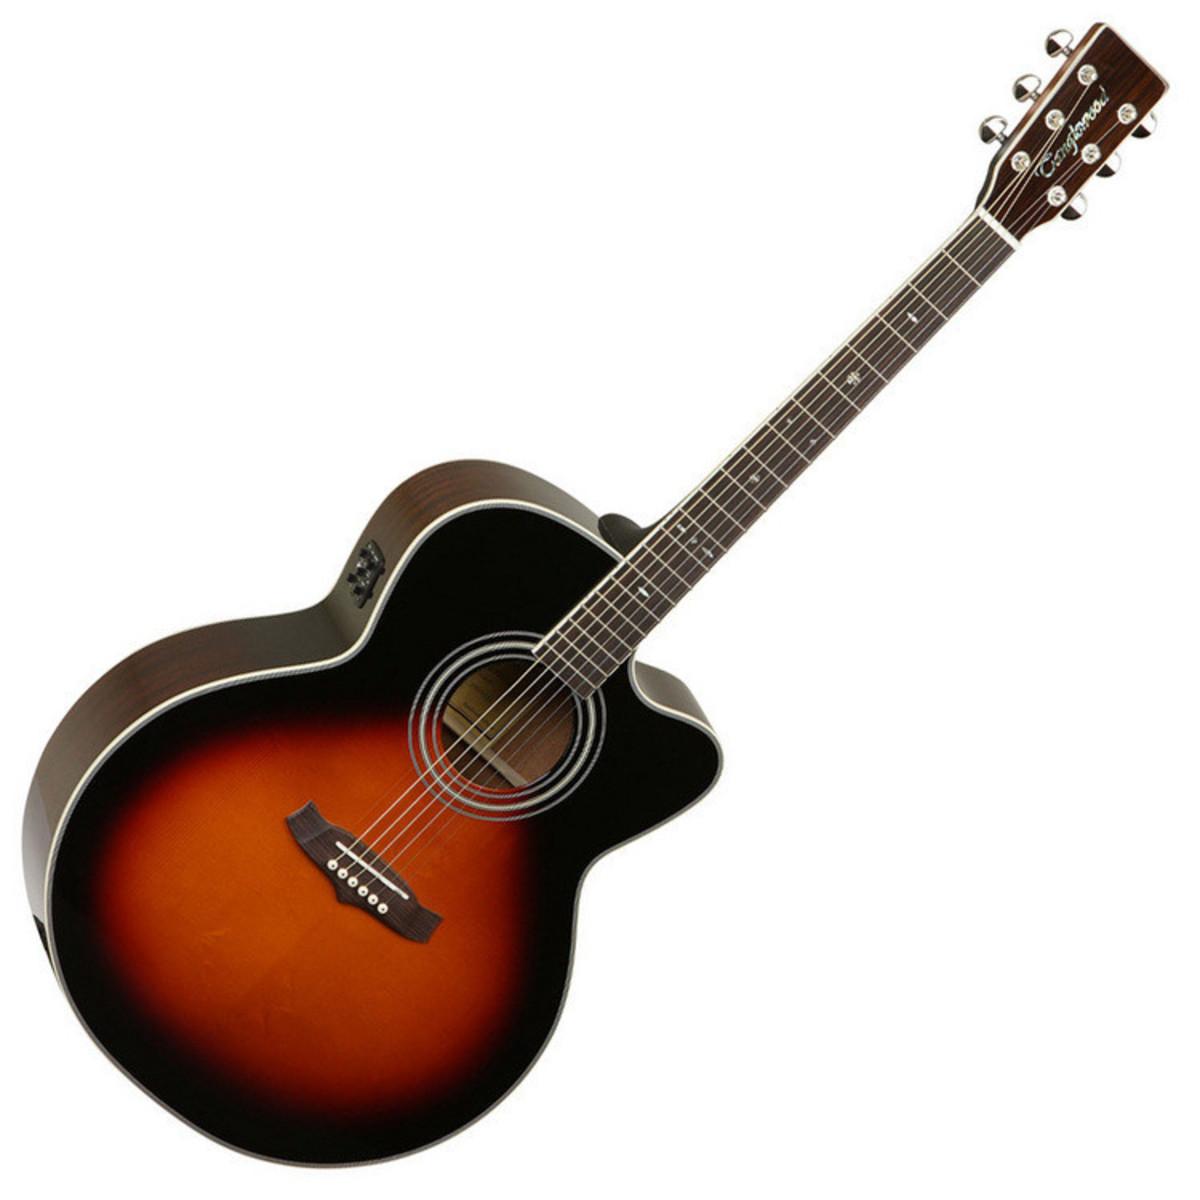 disc tanglewood tw55 acoustic guitar vintage sunburst free tuner at gear4music. Black Bedroom Furniture Sets. Home Design Ideas